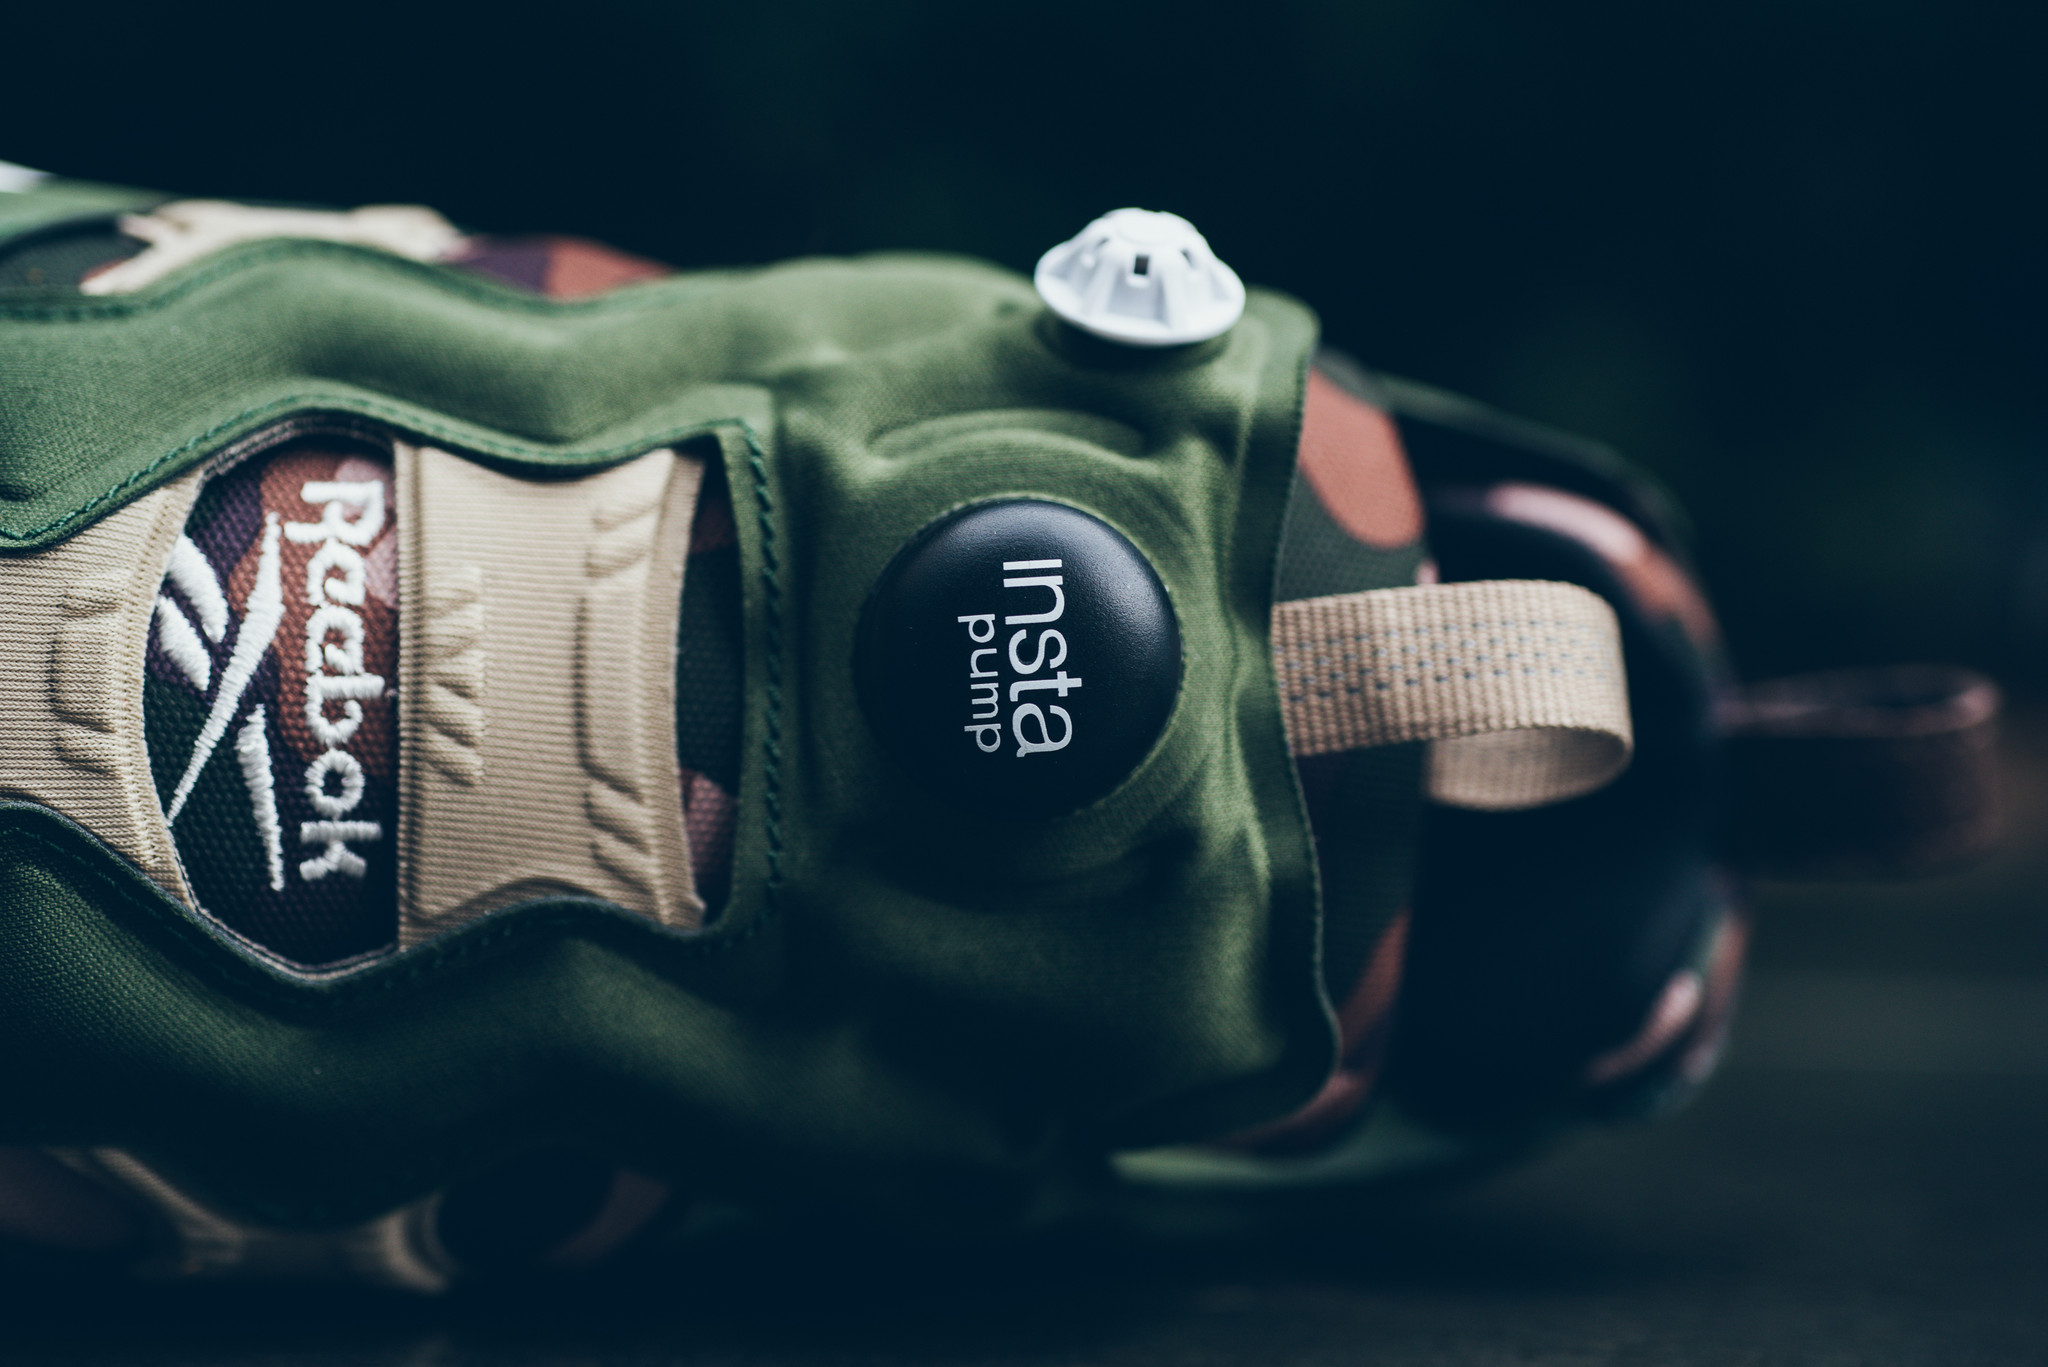 Instapump_Fury_OG_Camo_Sneaker_POlitics_Hypebeast_9